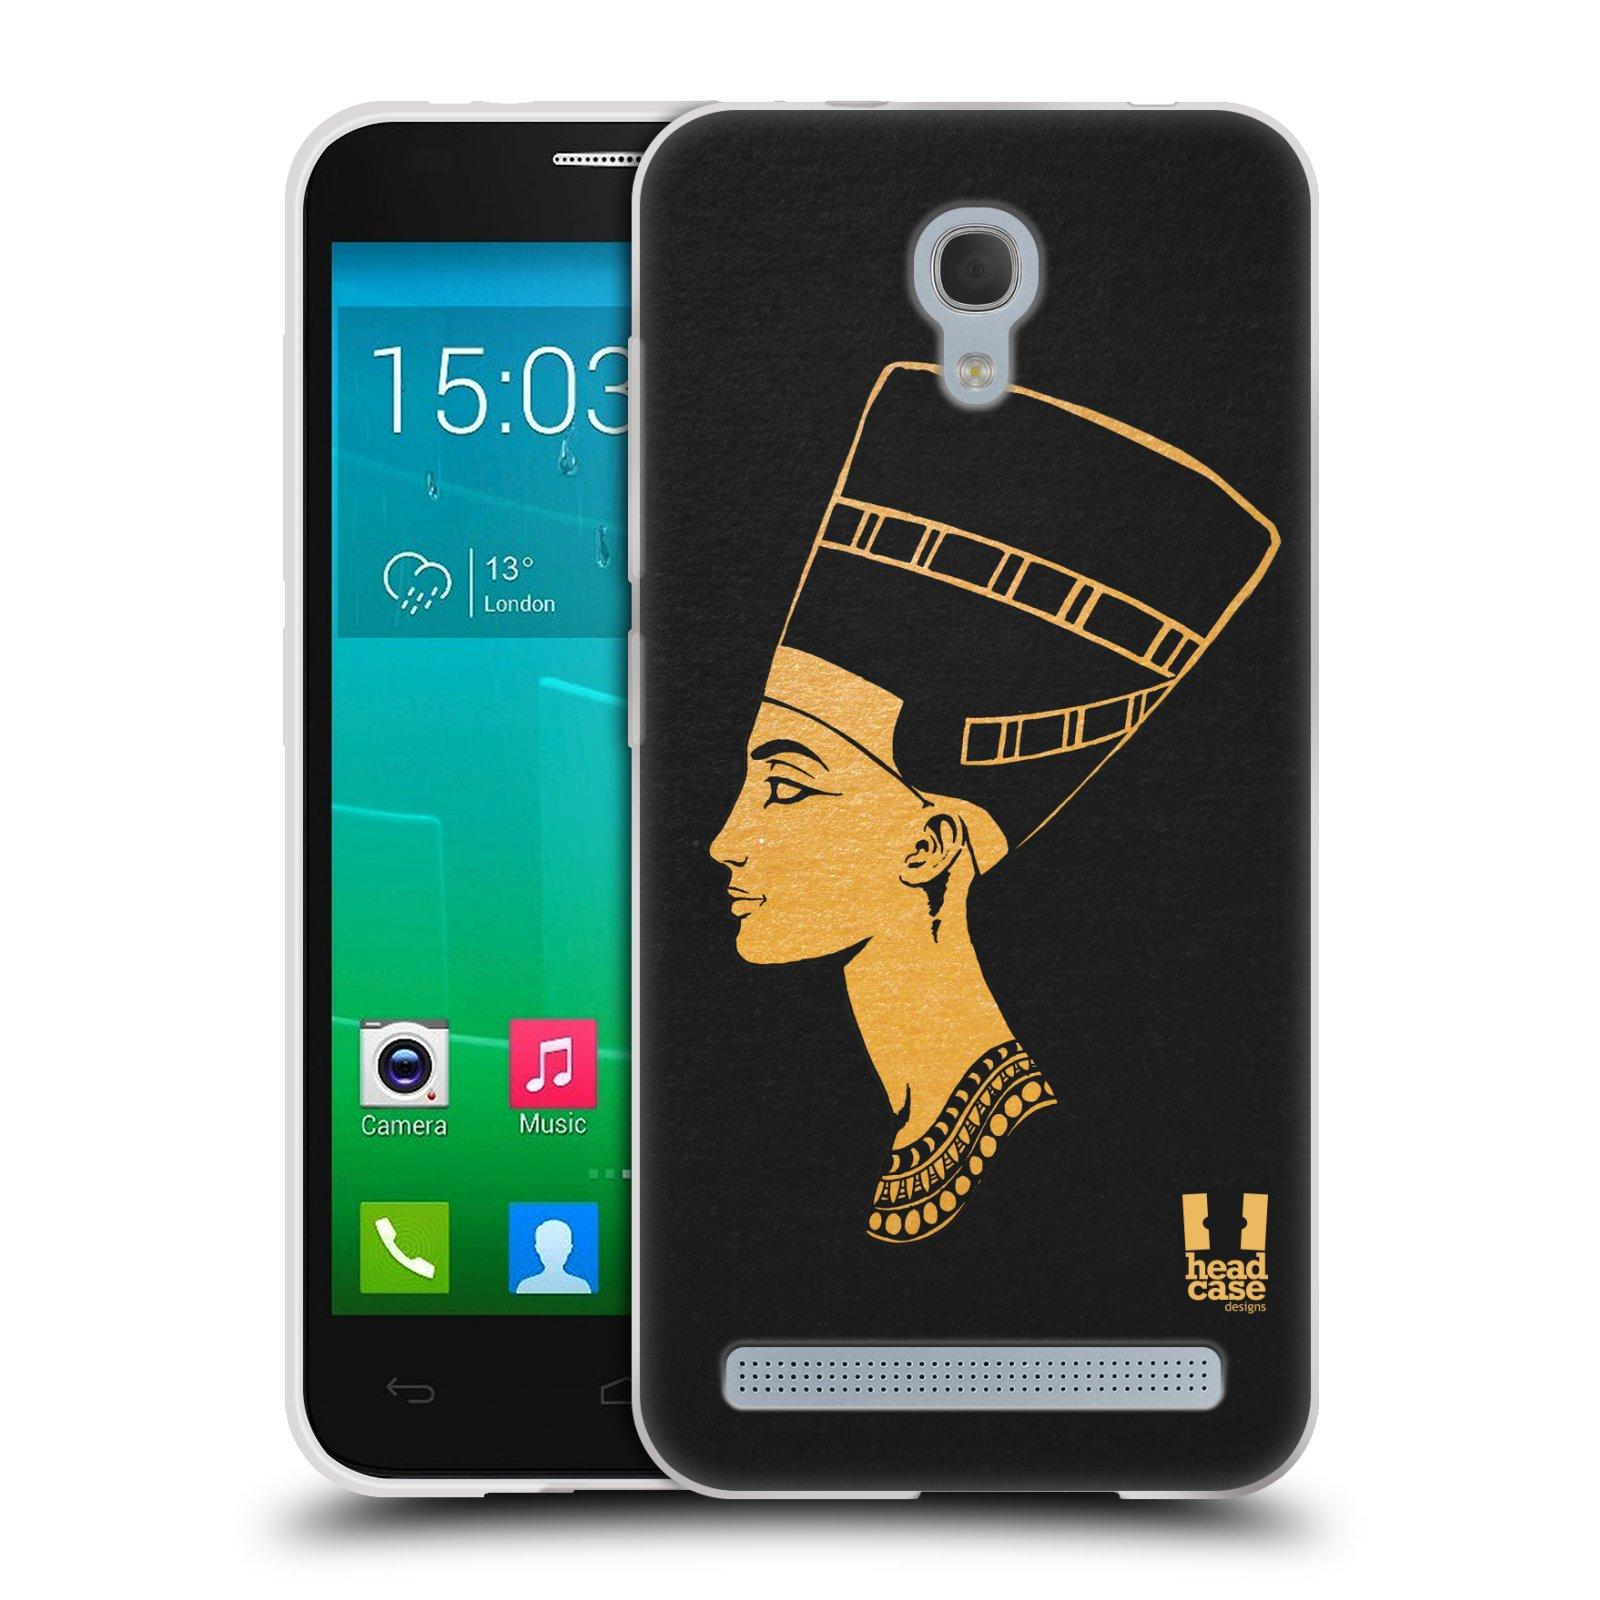 Silikonové pouzdro na mobil Alcatel One Touch Idol 2 Mini S 6036Y HEAD CASE EGYPT NEFERTITI (Silikonový kryt či obal na mobilní telefon Alcatel Idol 2 Mini S OT-6036Y)